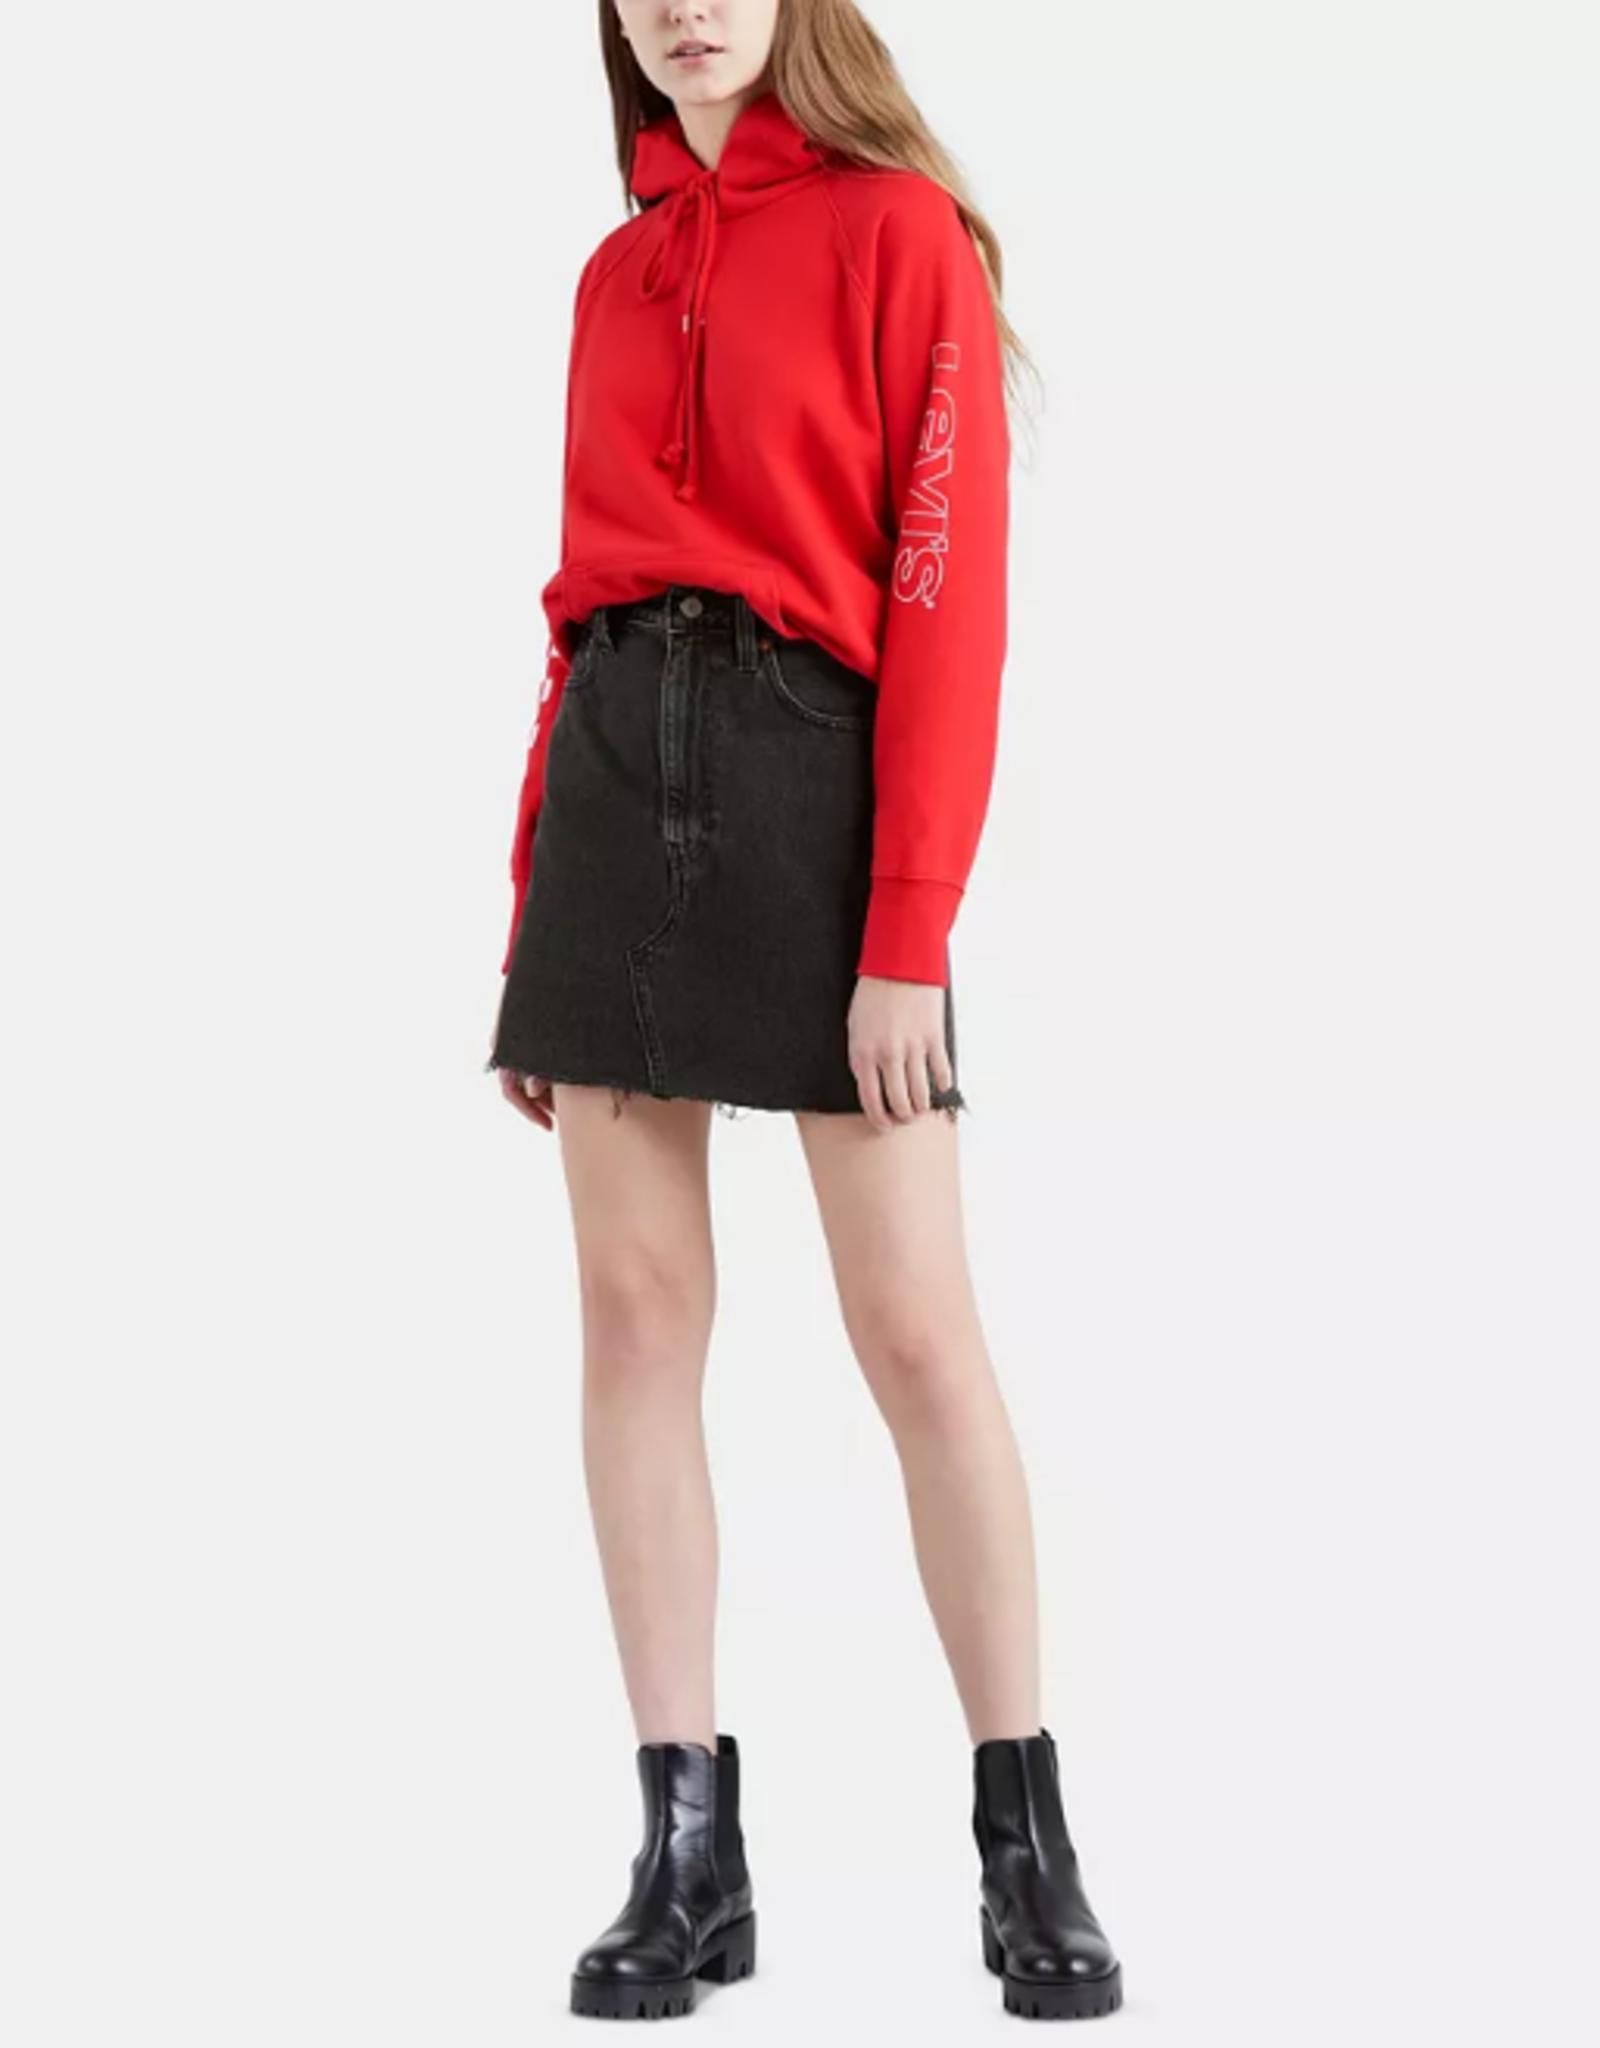 Levi's Iconic Cotton Denim Mini Skirt In Turn (Washed Black)